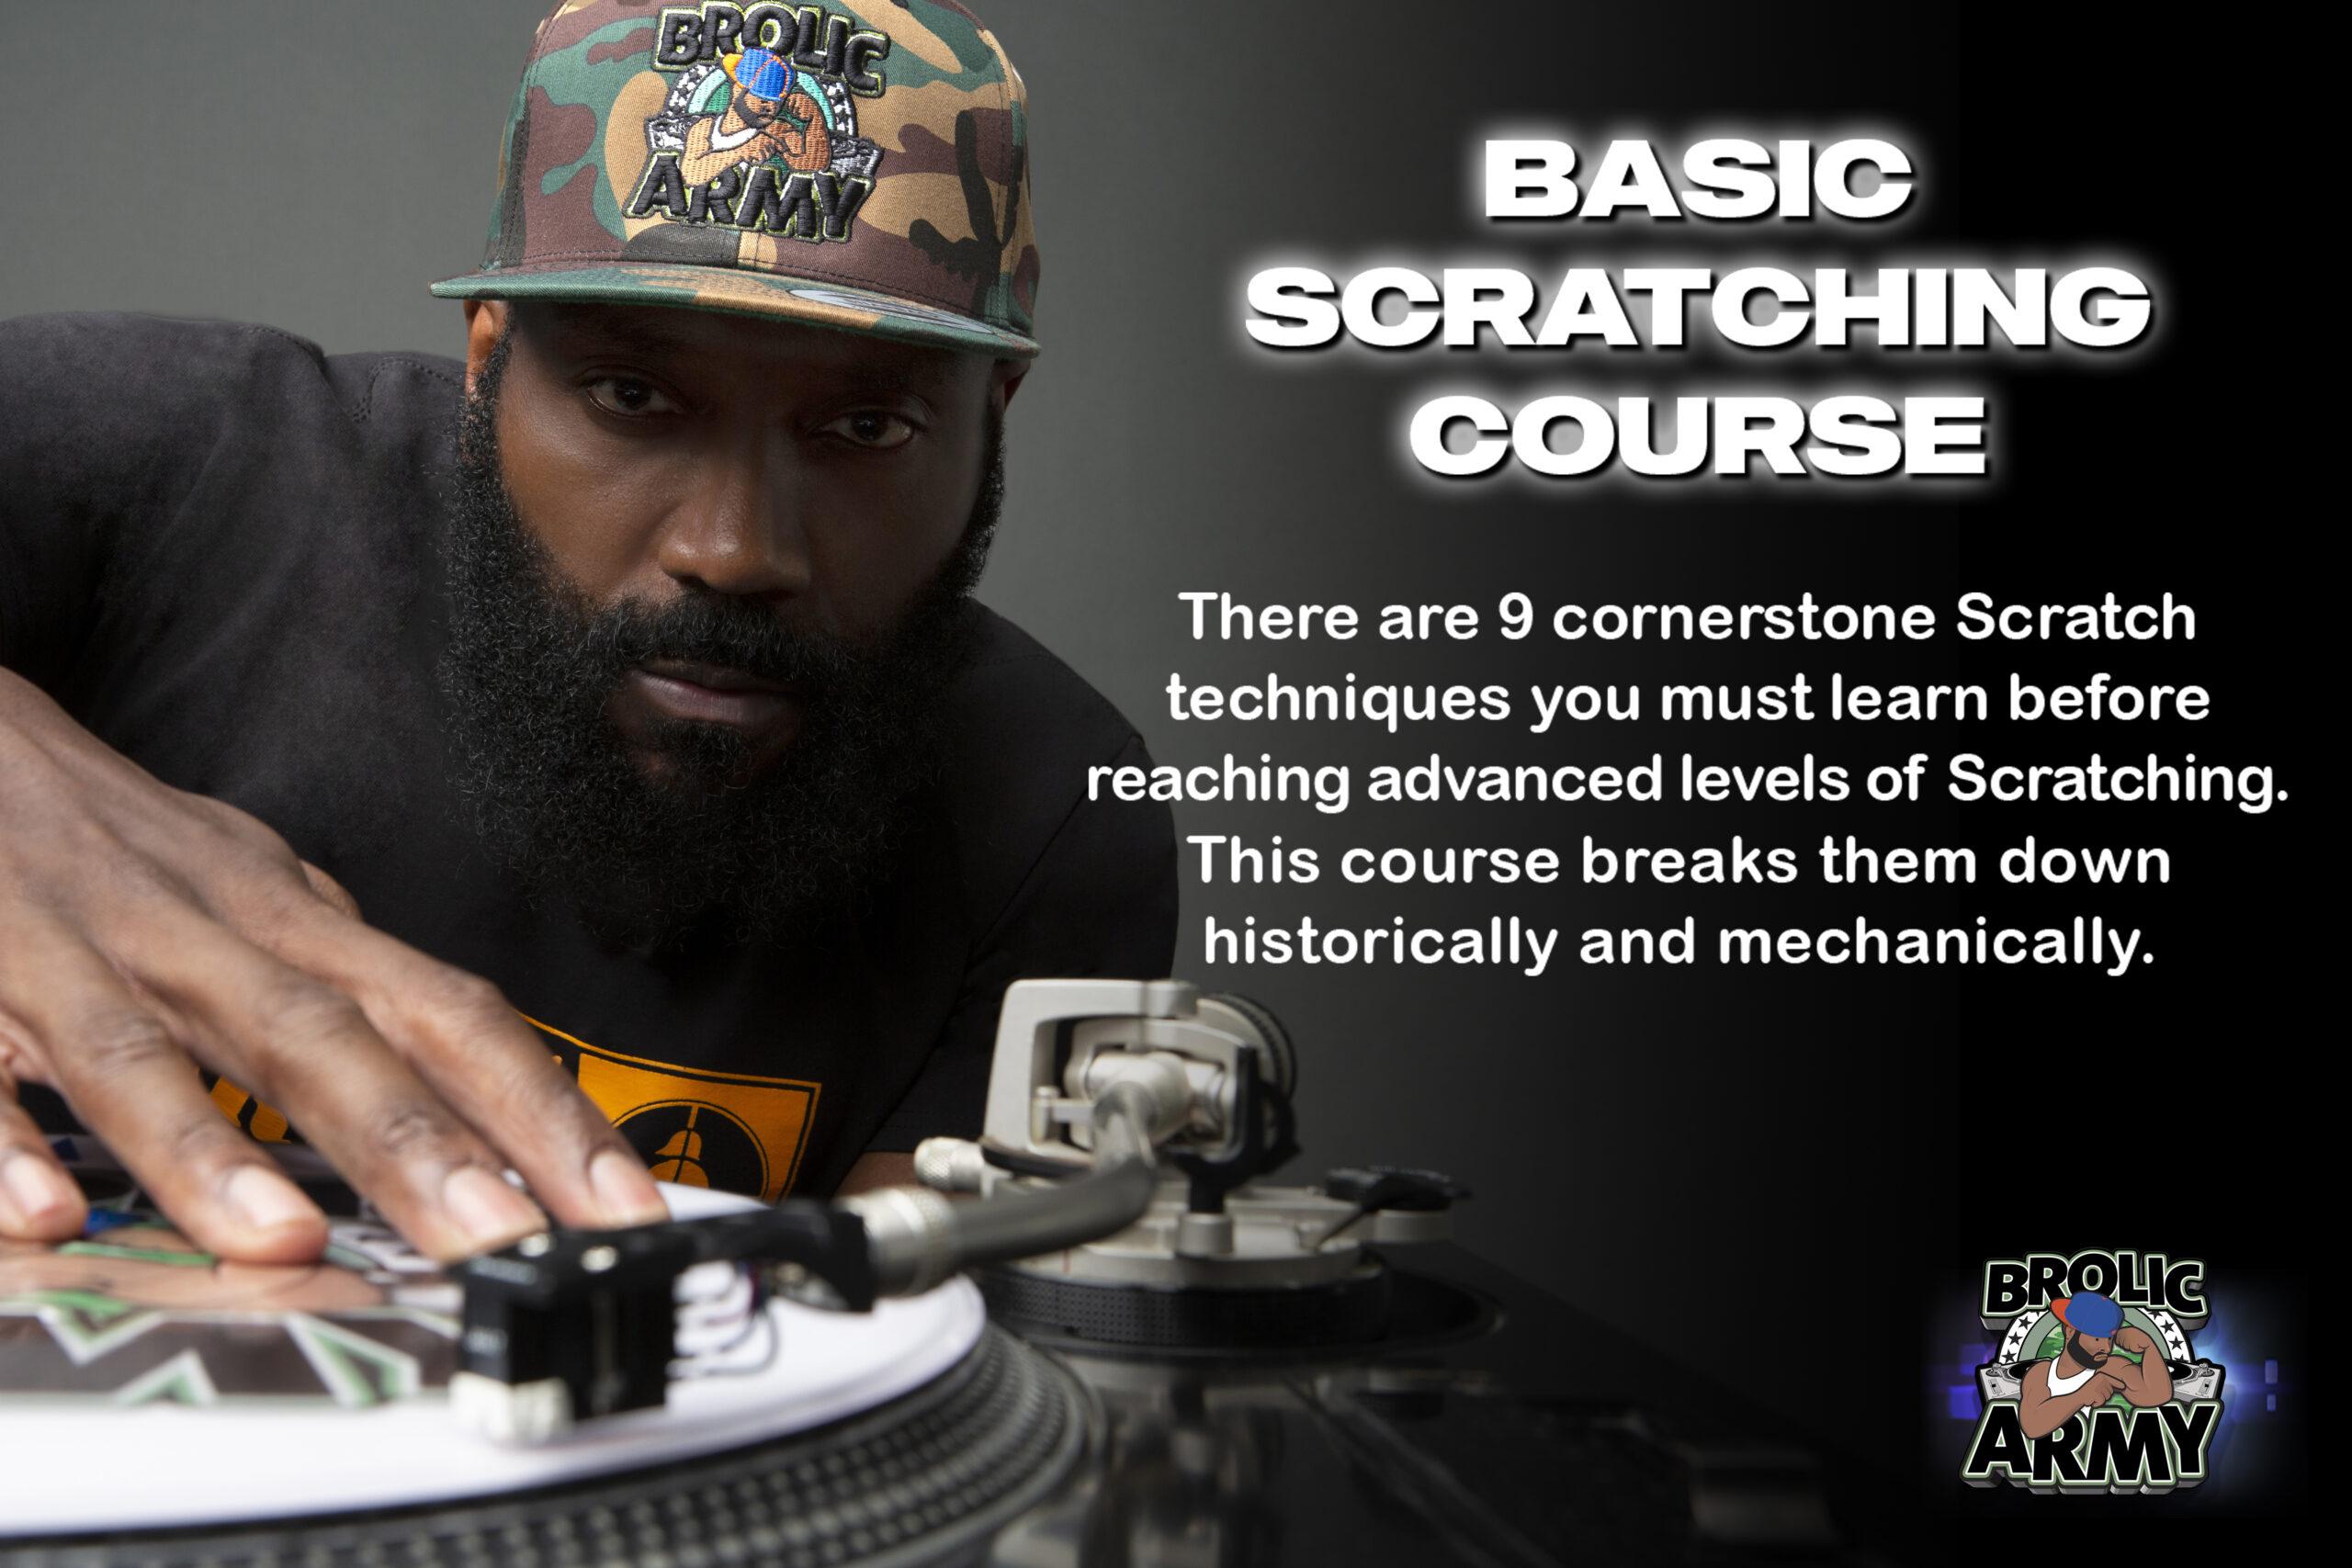 Basic Scratching